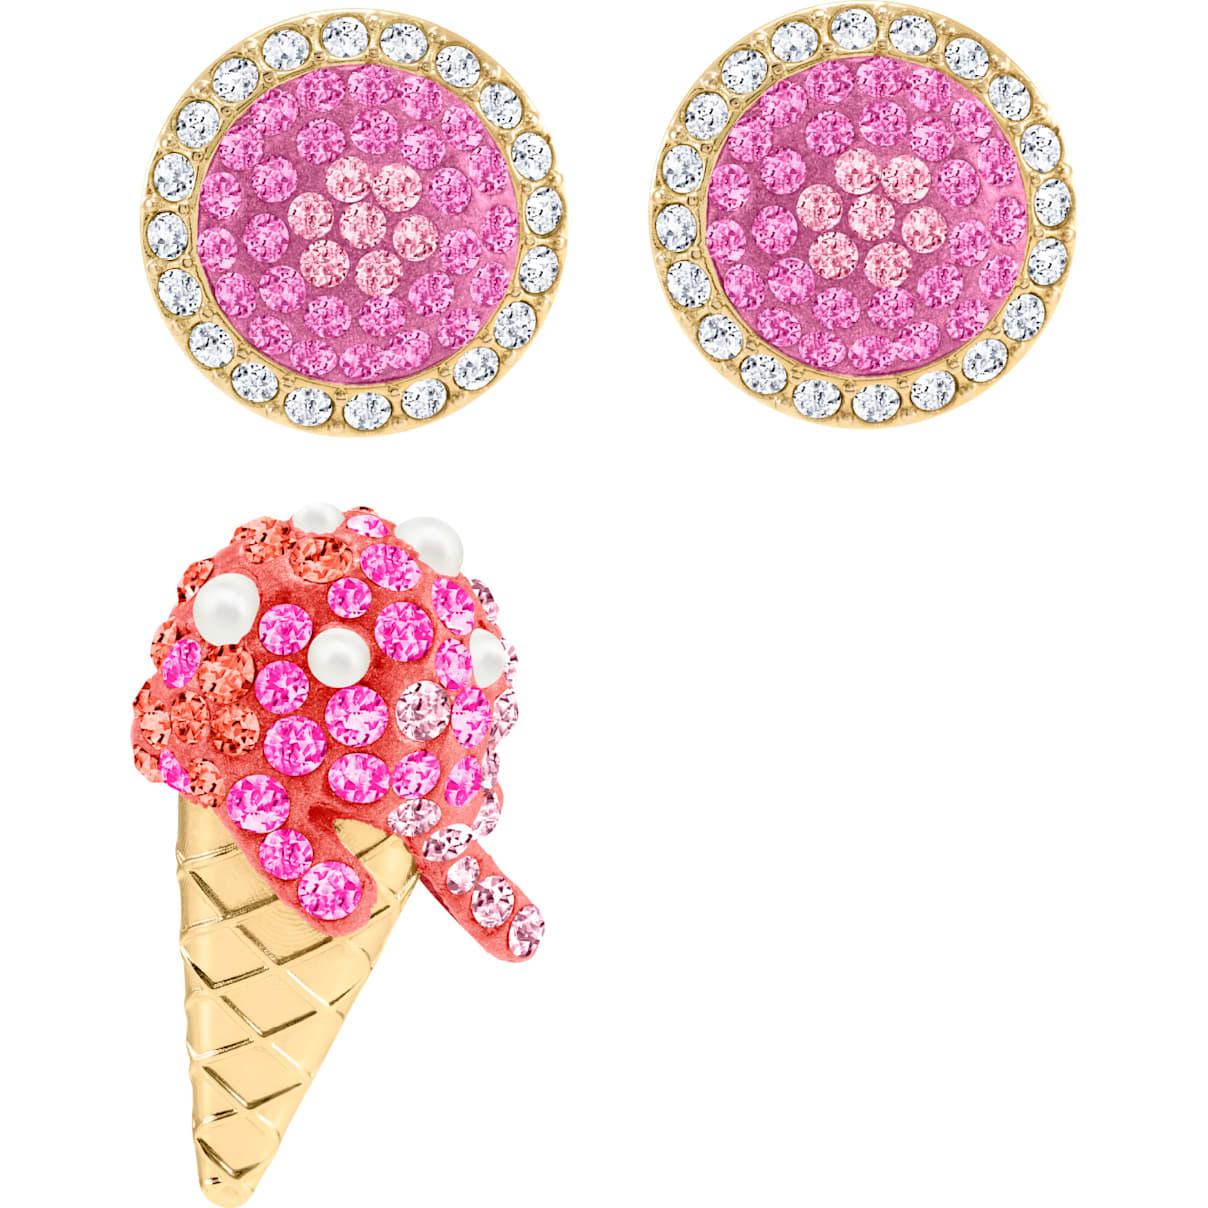 Swarovski No Regrets Ice Cream Pierced Earrings, Multi-colored, Gold-tone plated